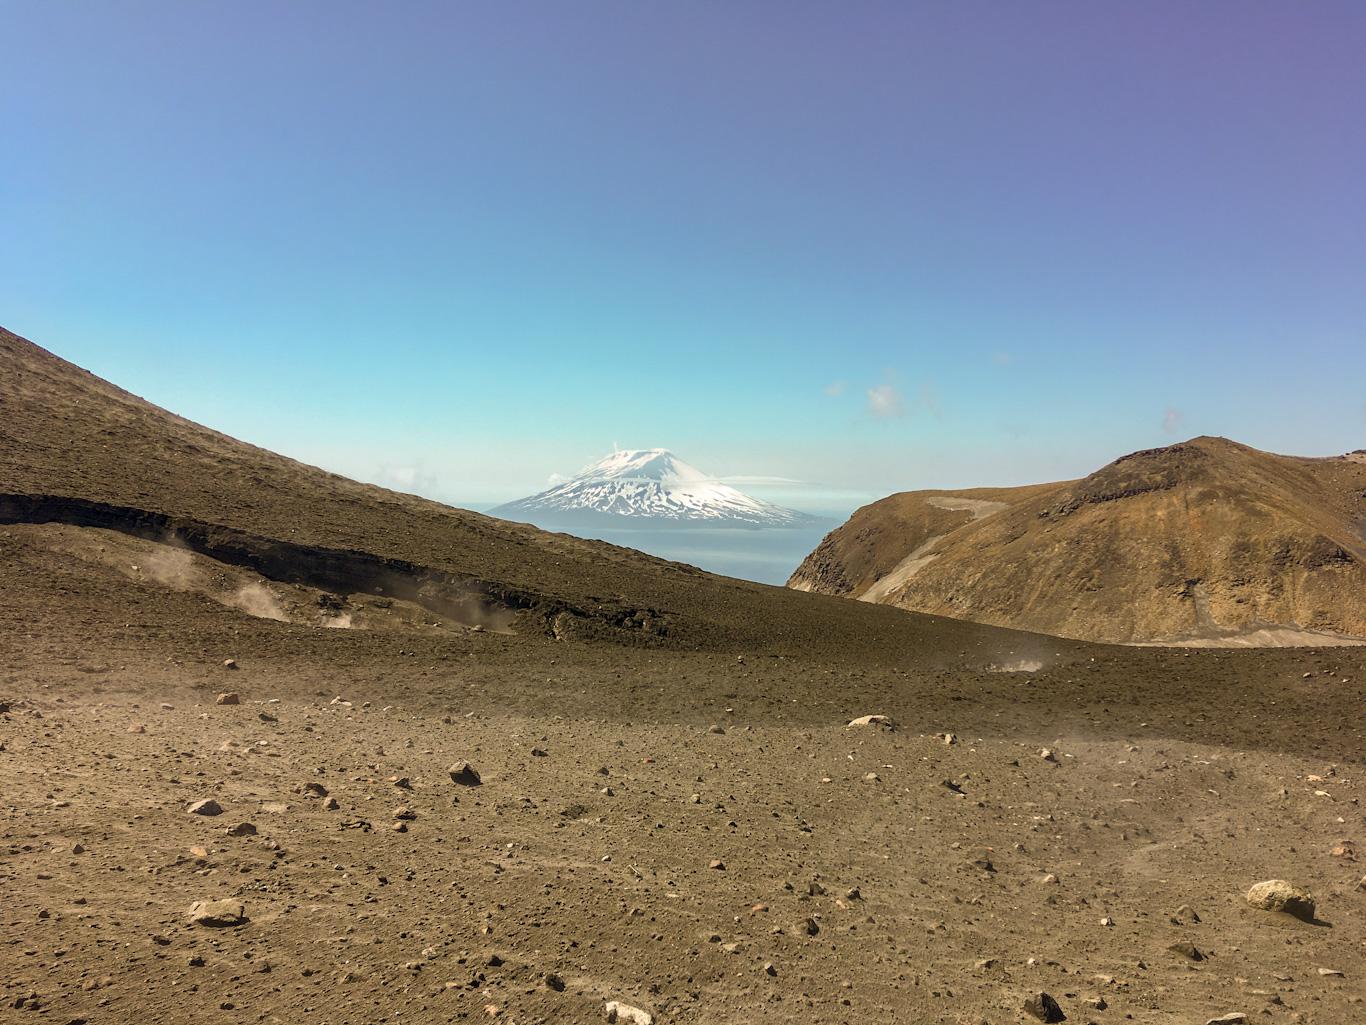 вулкан Алаид, вид от подножия Эбеко